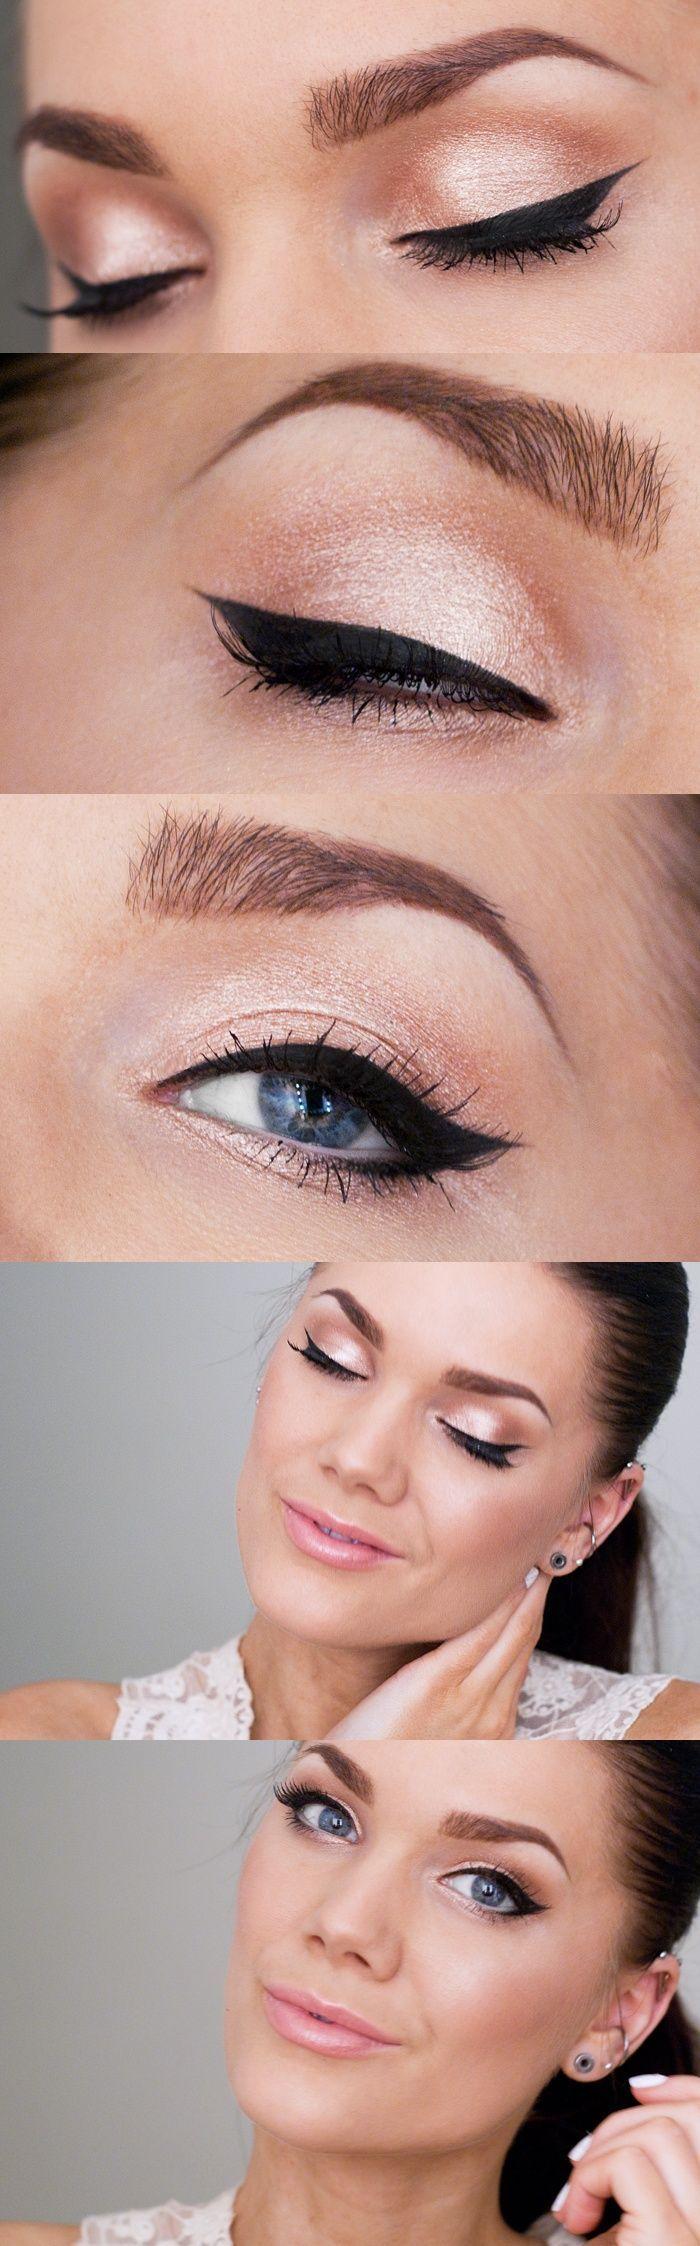 Natural eye makeup top 10 simple easy makeup tutorials natural eye makeup top 10 simple easy makeup tutorials baditri Images